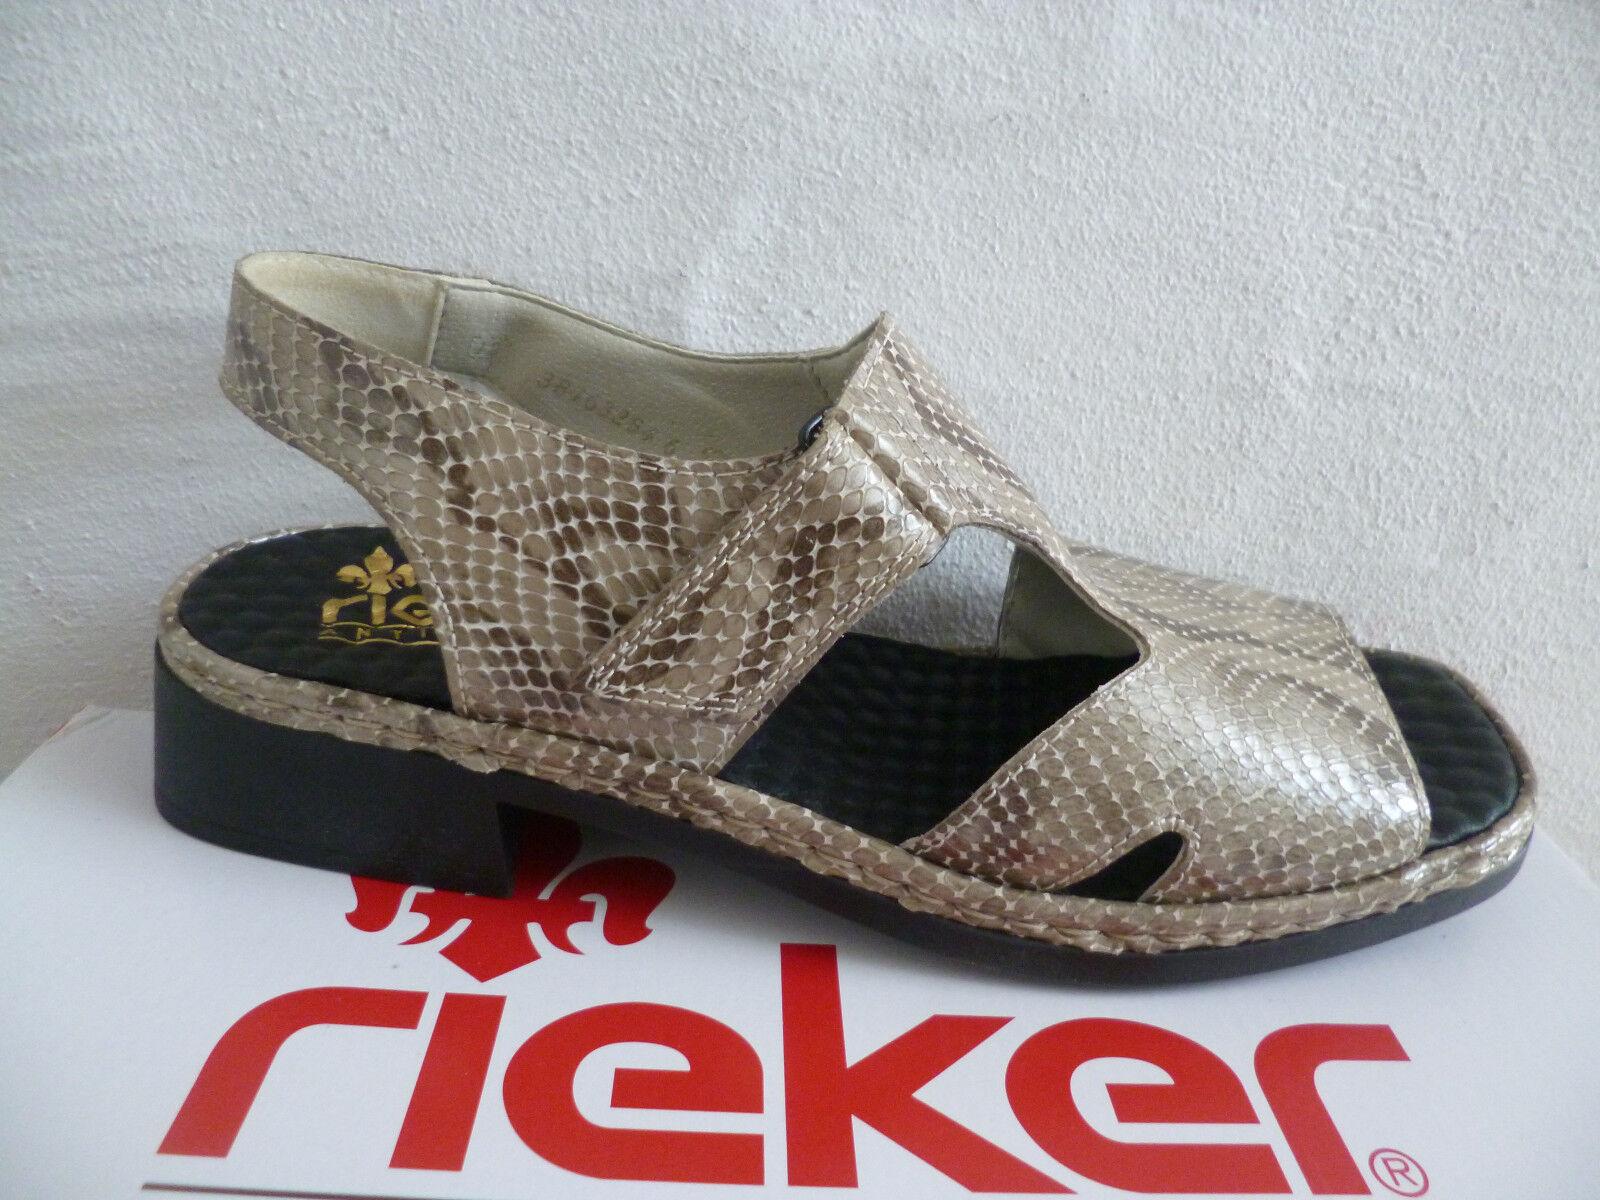 Rieker Damen Sandale Sandalette grau multi Krokoleder NEU